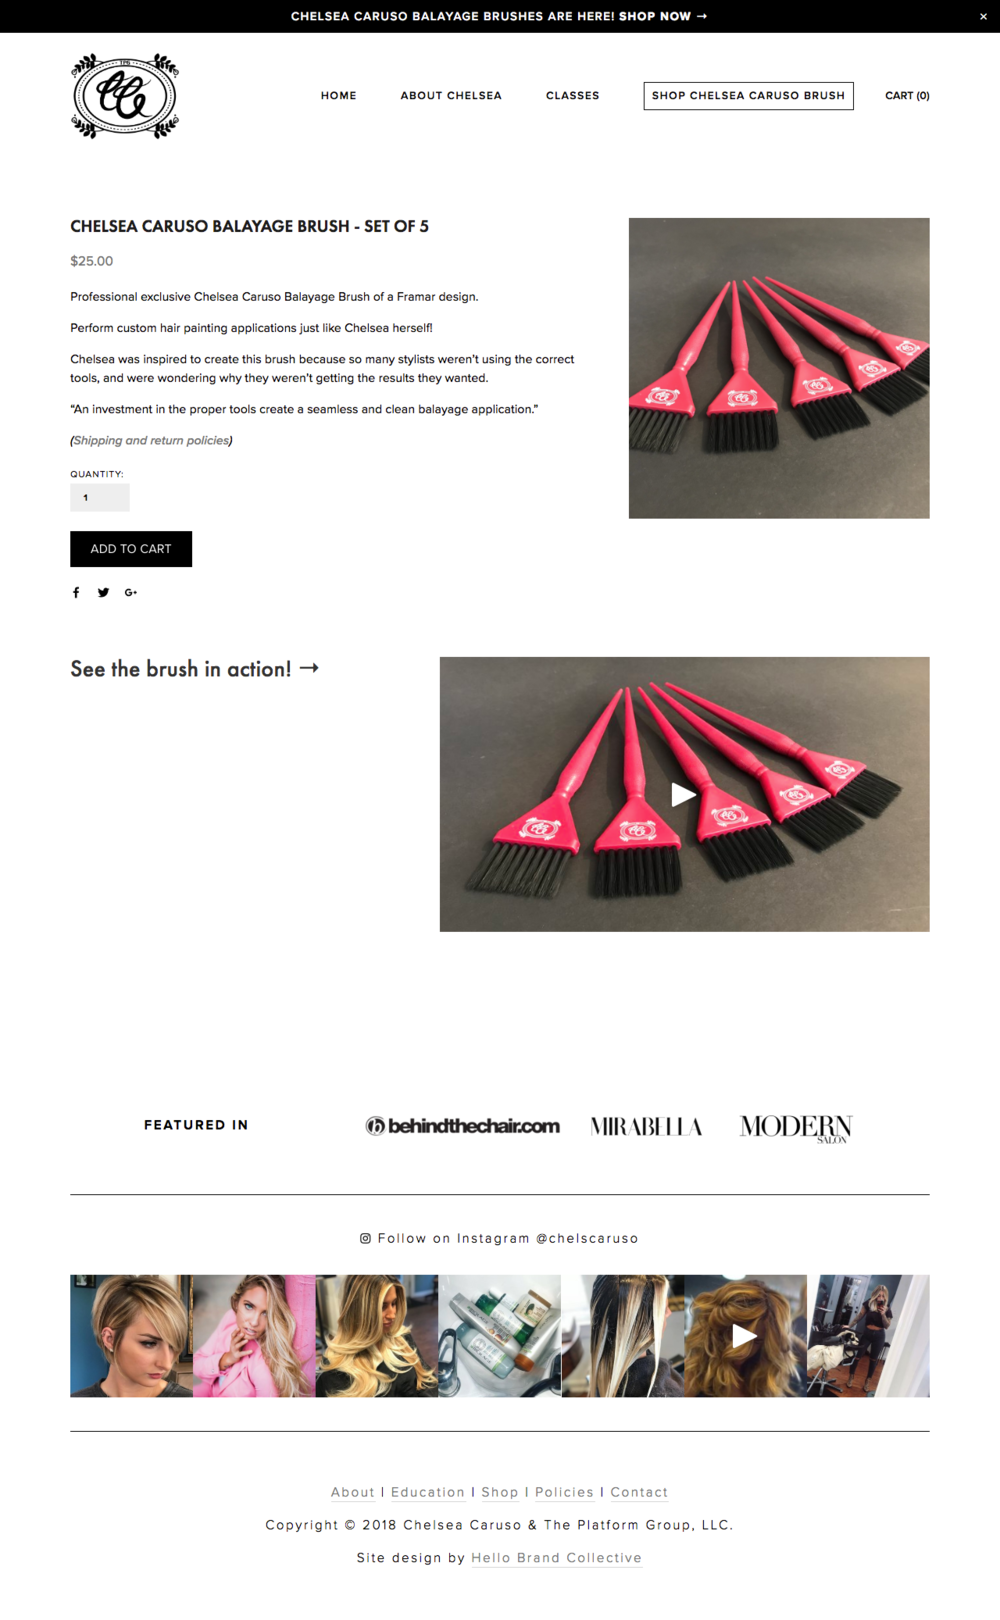 screencapture-chelseacaruso-squarespace-shop-balayage-brush-2018-11-24-01_42_10.png